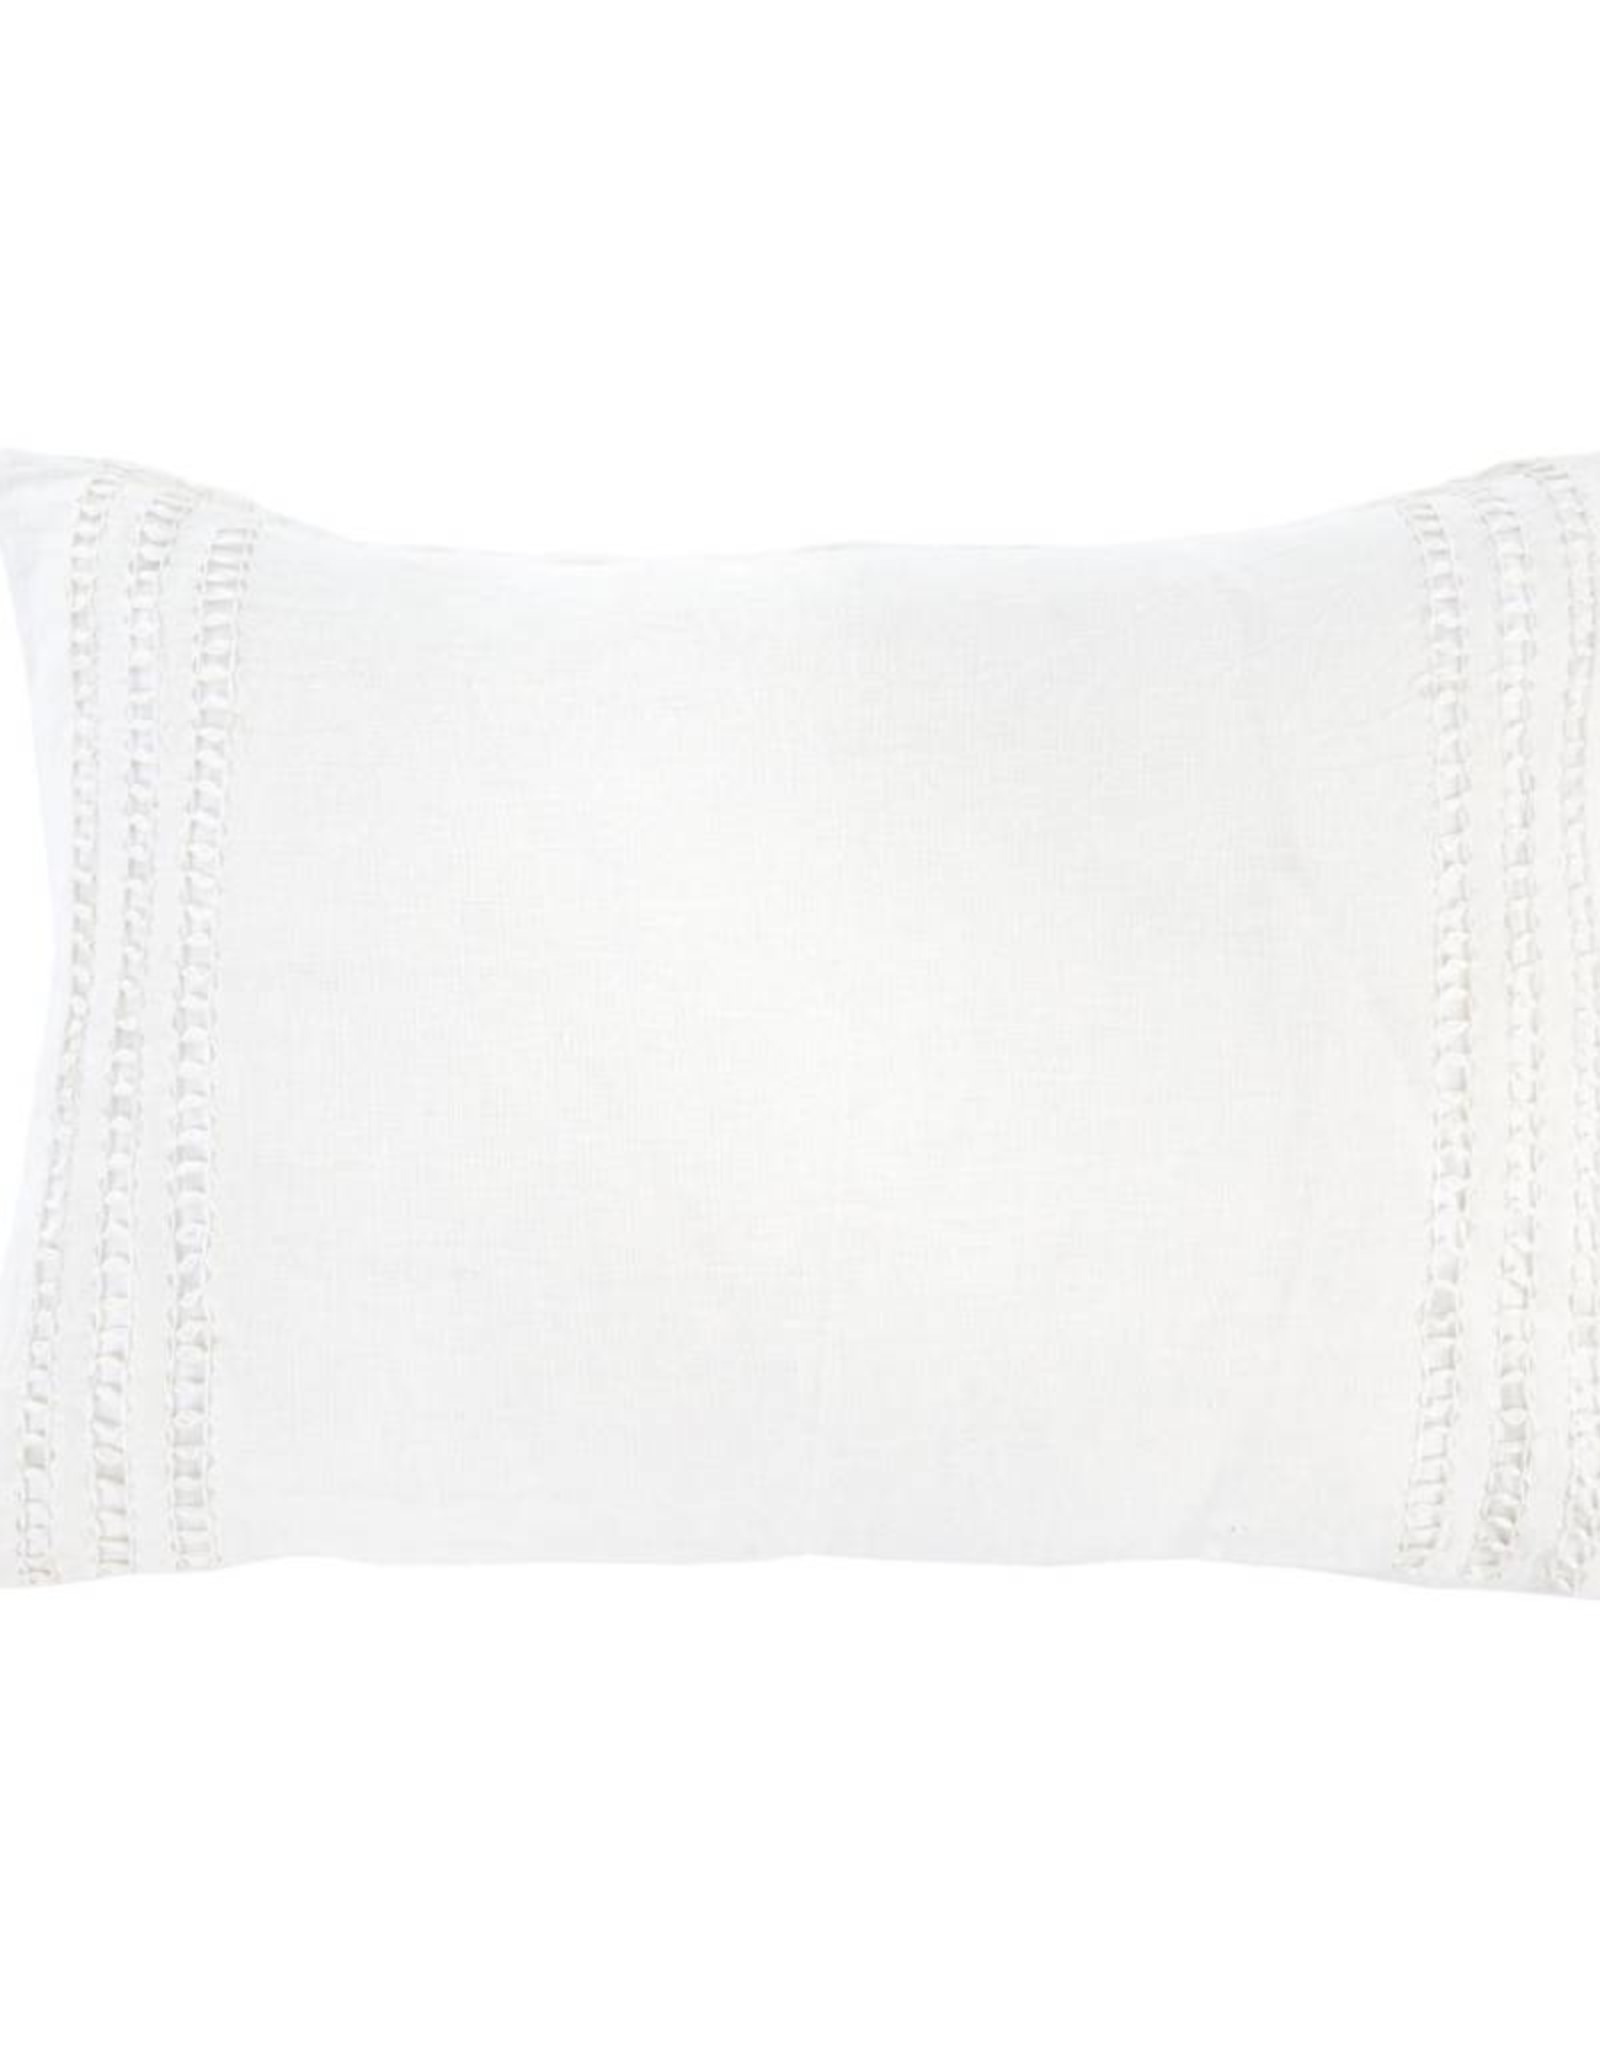 Coventina Lumbar Pillow - White - Vertical Pattern